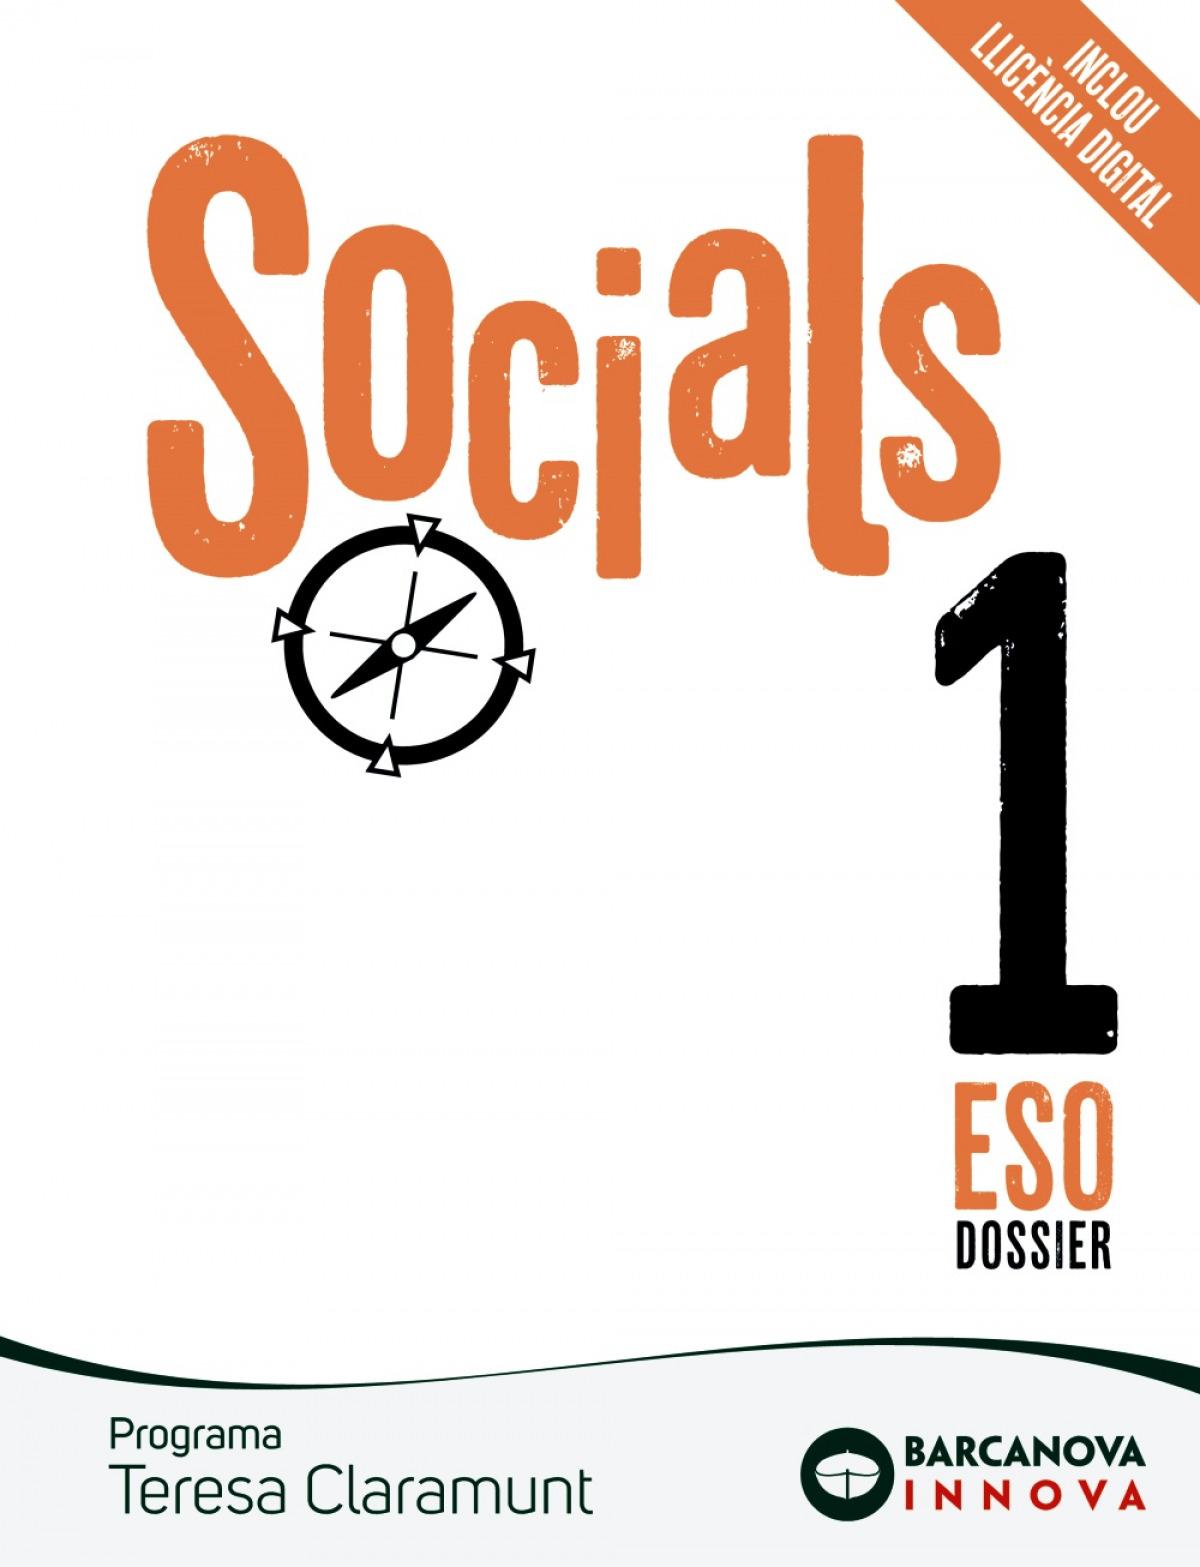 Teresa Claramunt 1 ESO. Socials